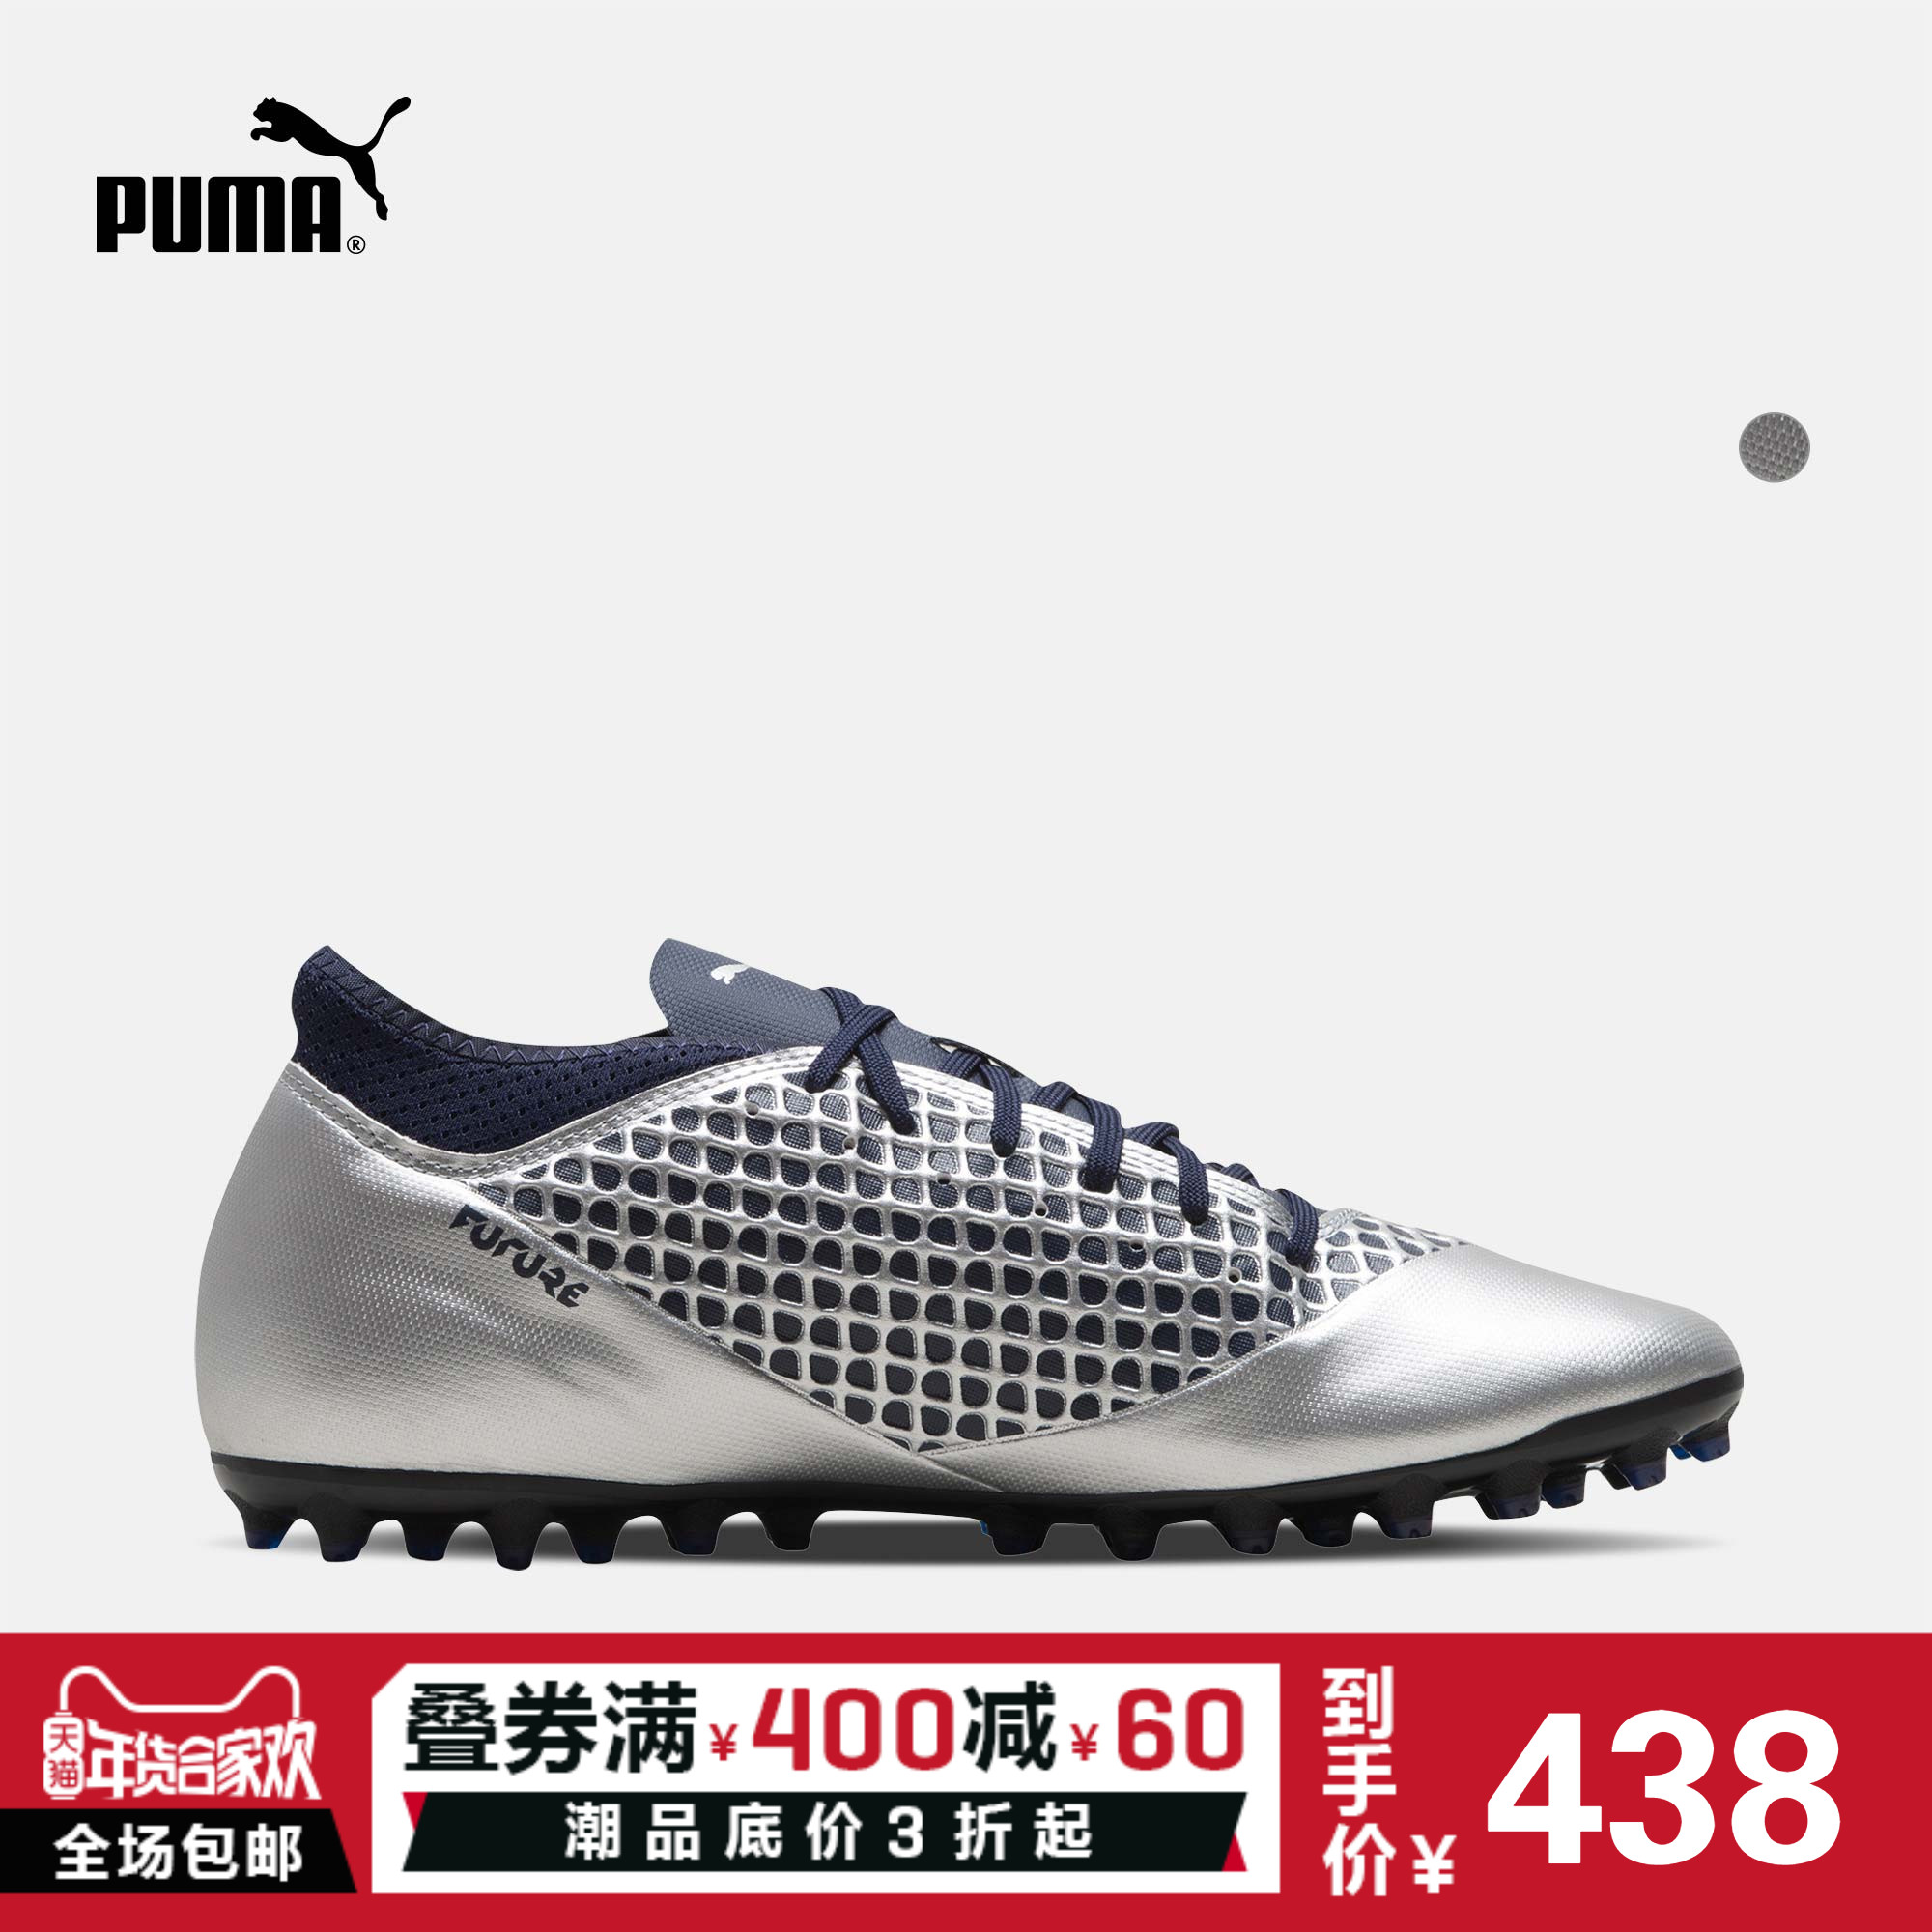 PUMA彪马官方 男子足球鞋 FUTURE 2.4 MG 104840